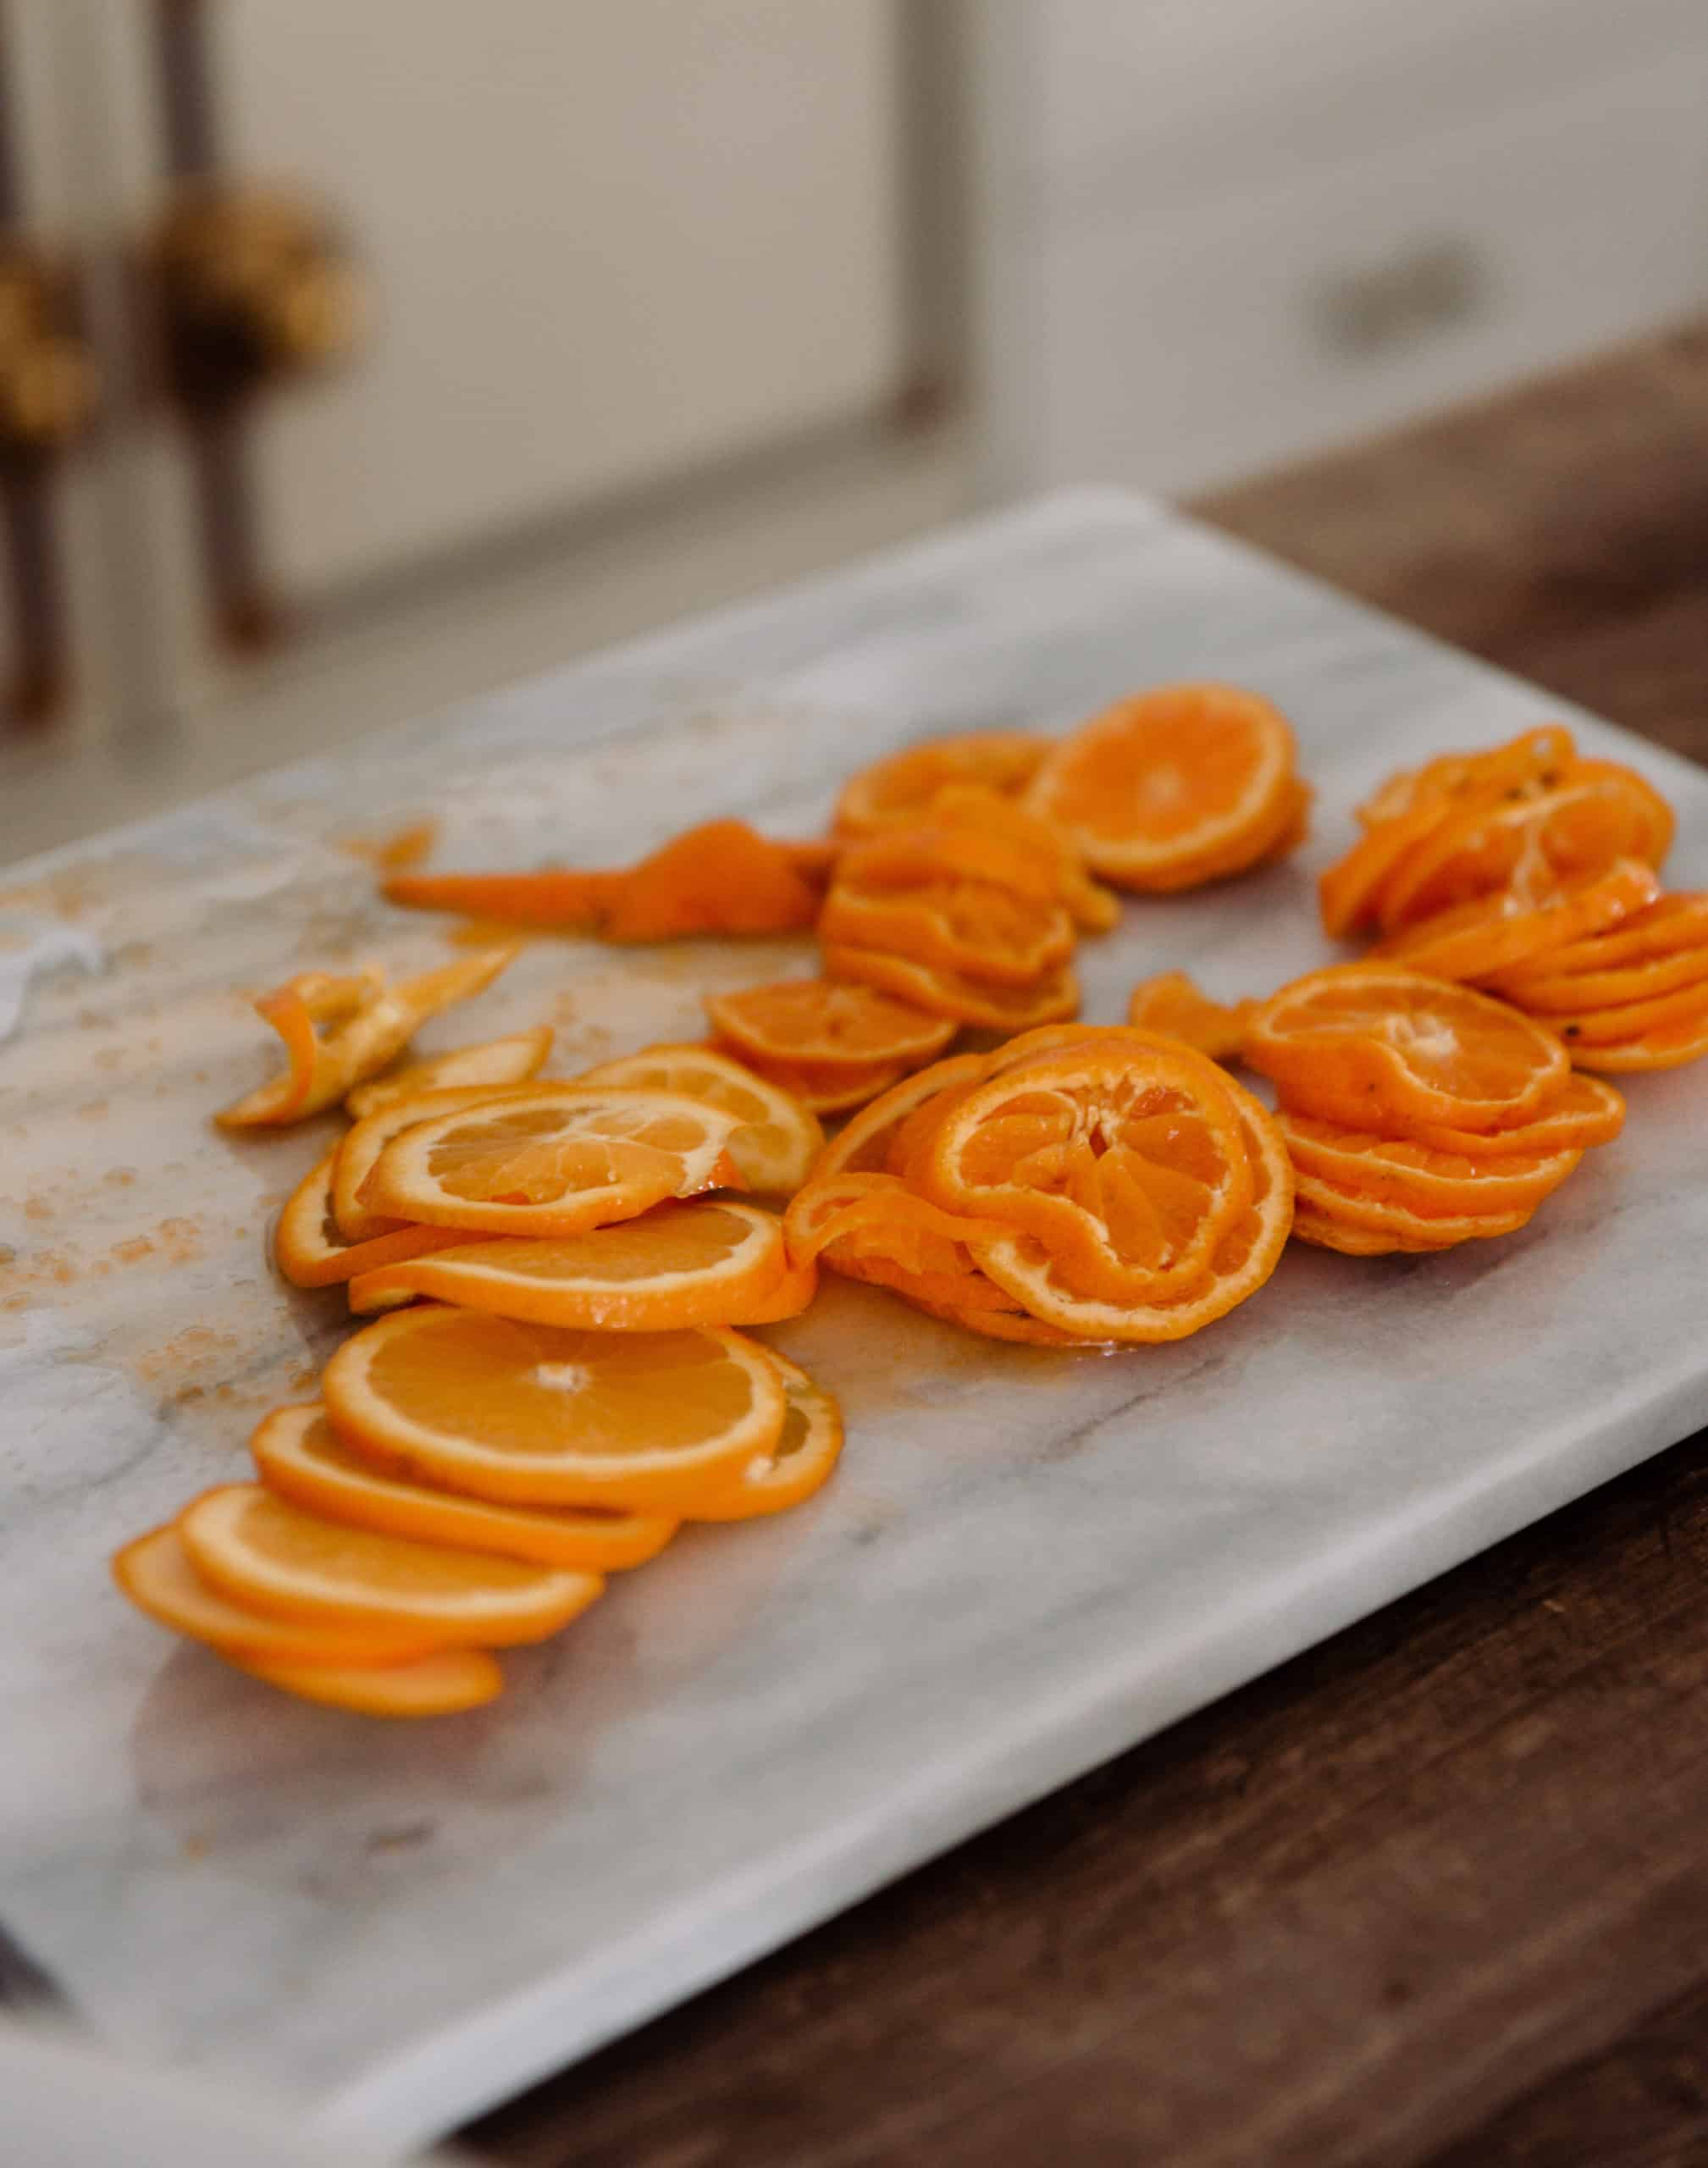 slide oranges on marble cutting board for orange marmalade